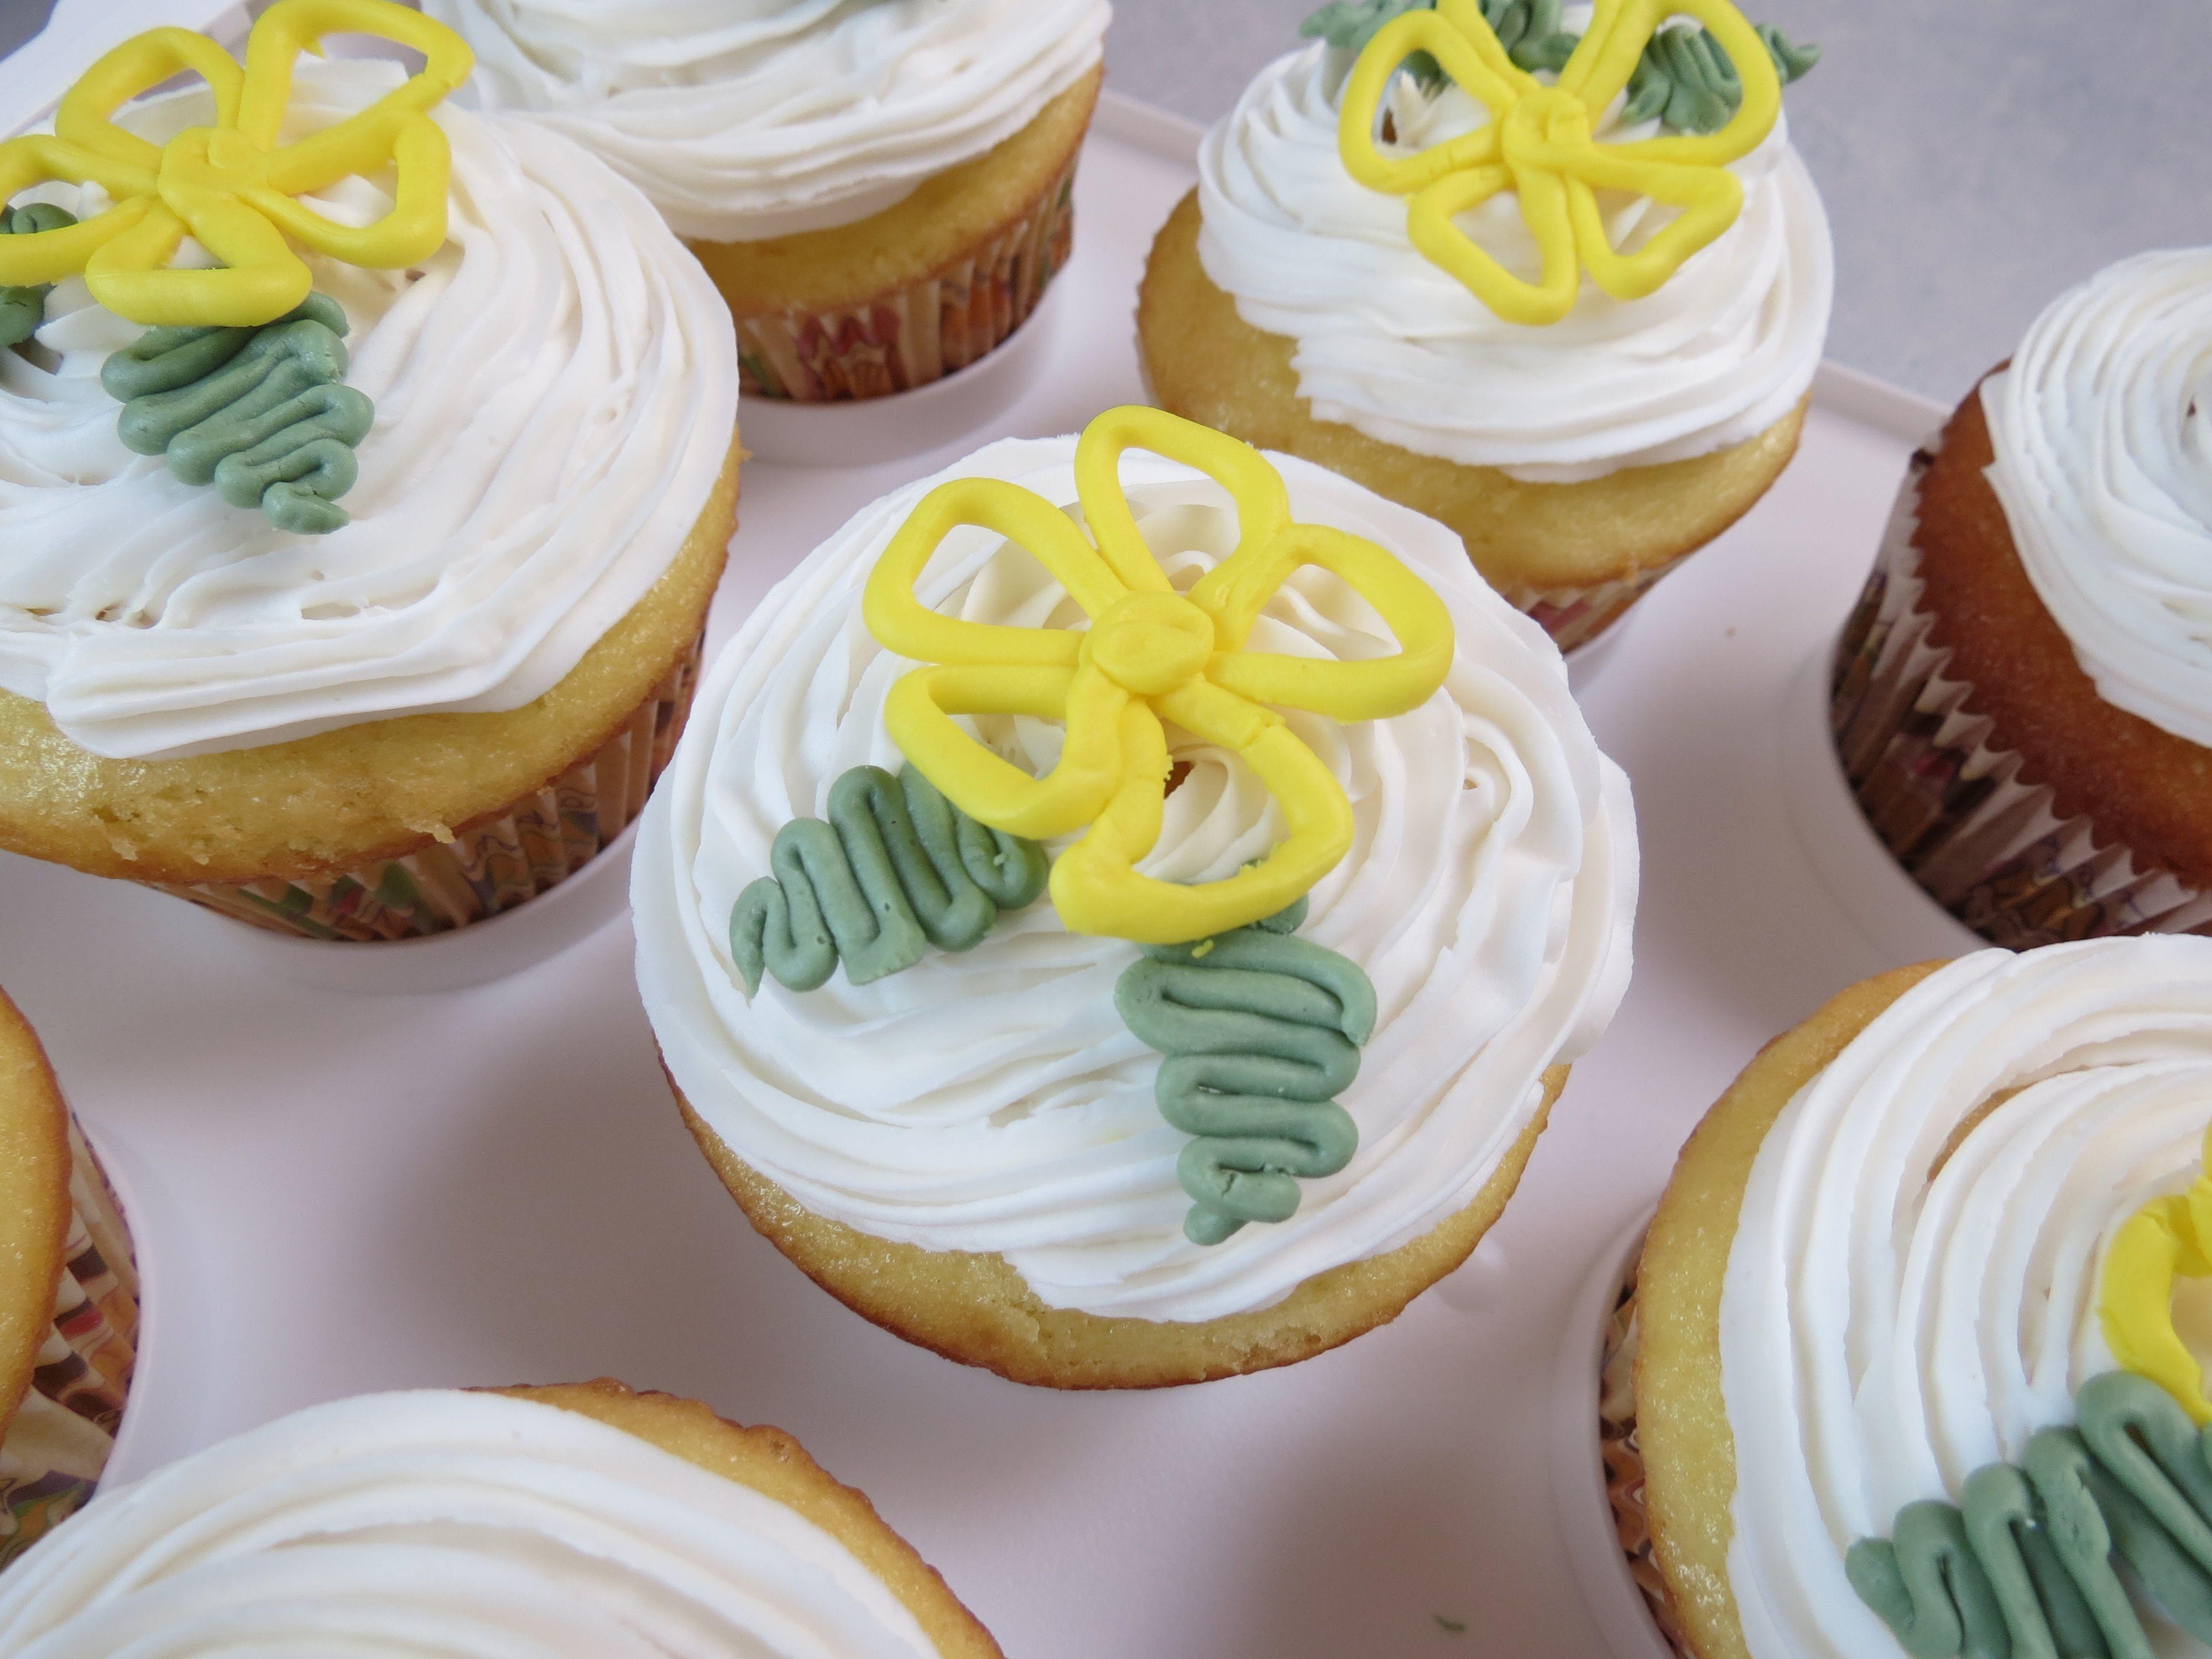 Lemon flavored cupcakes lemon flavored cupcakes